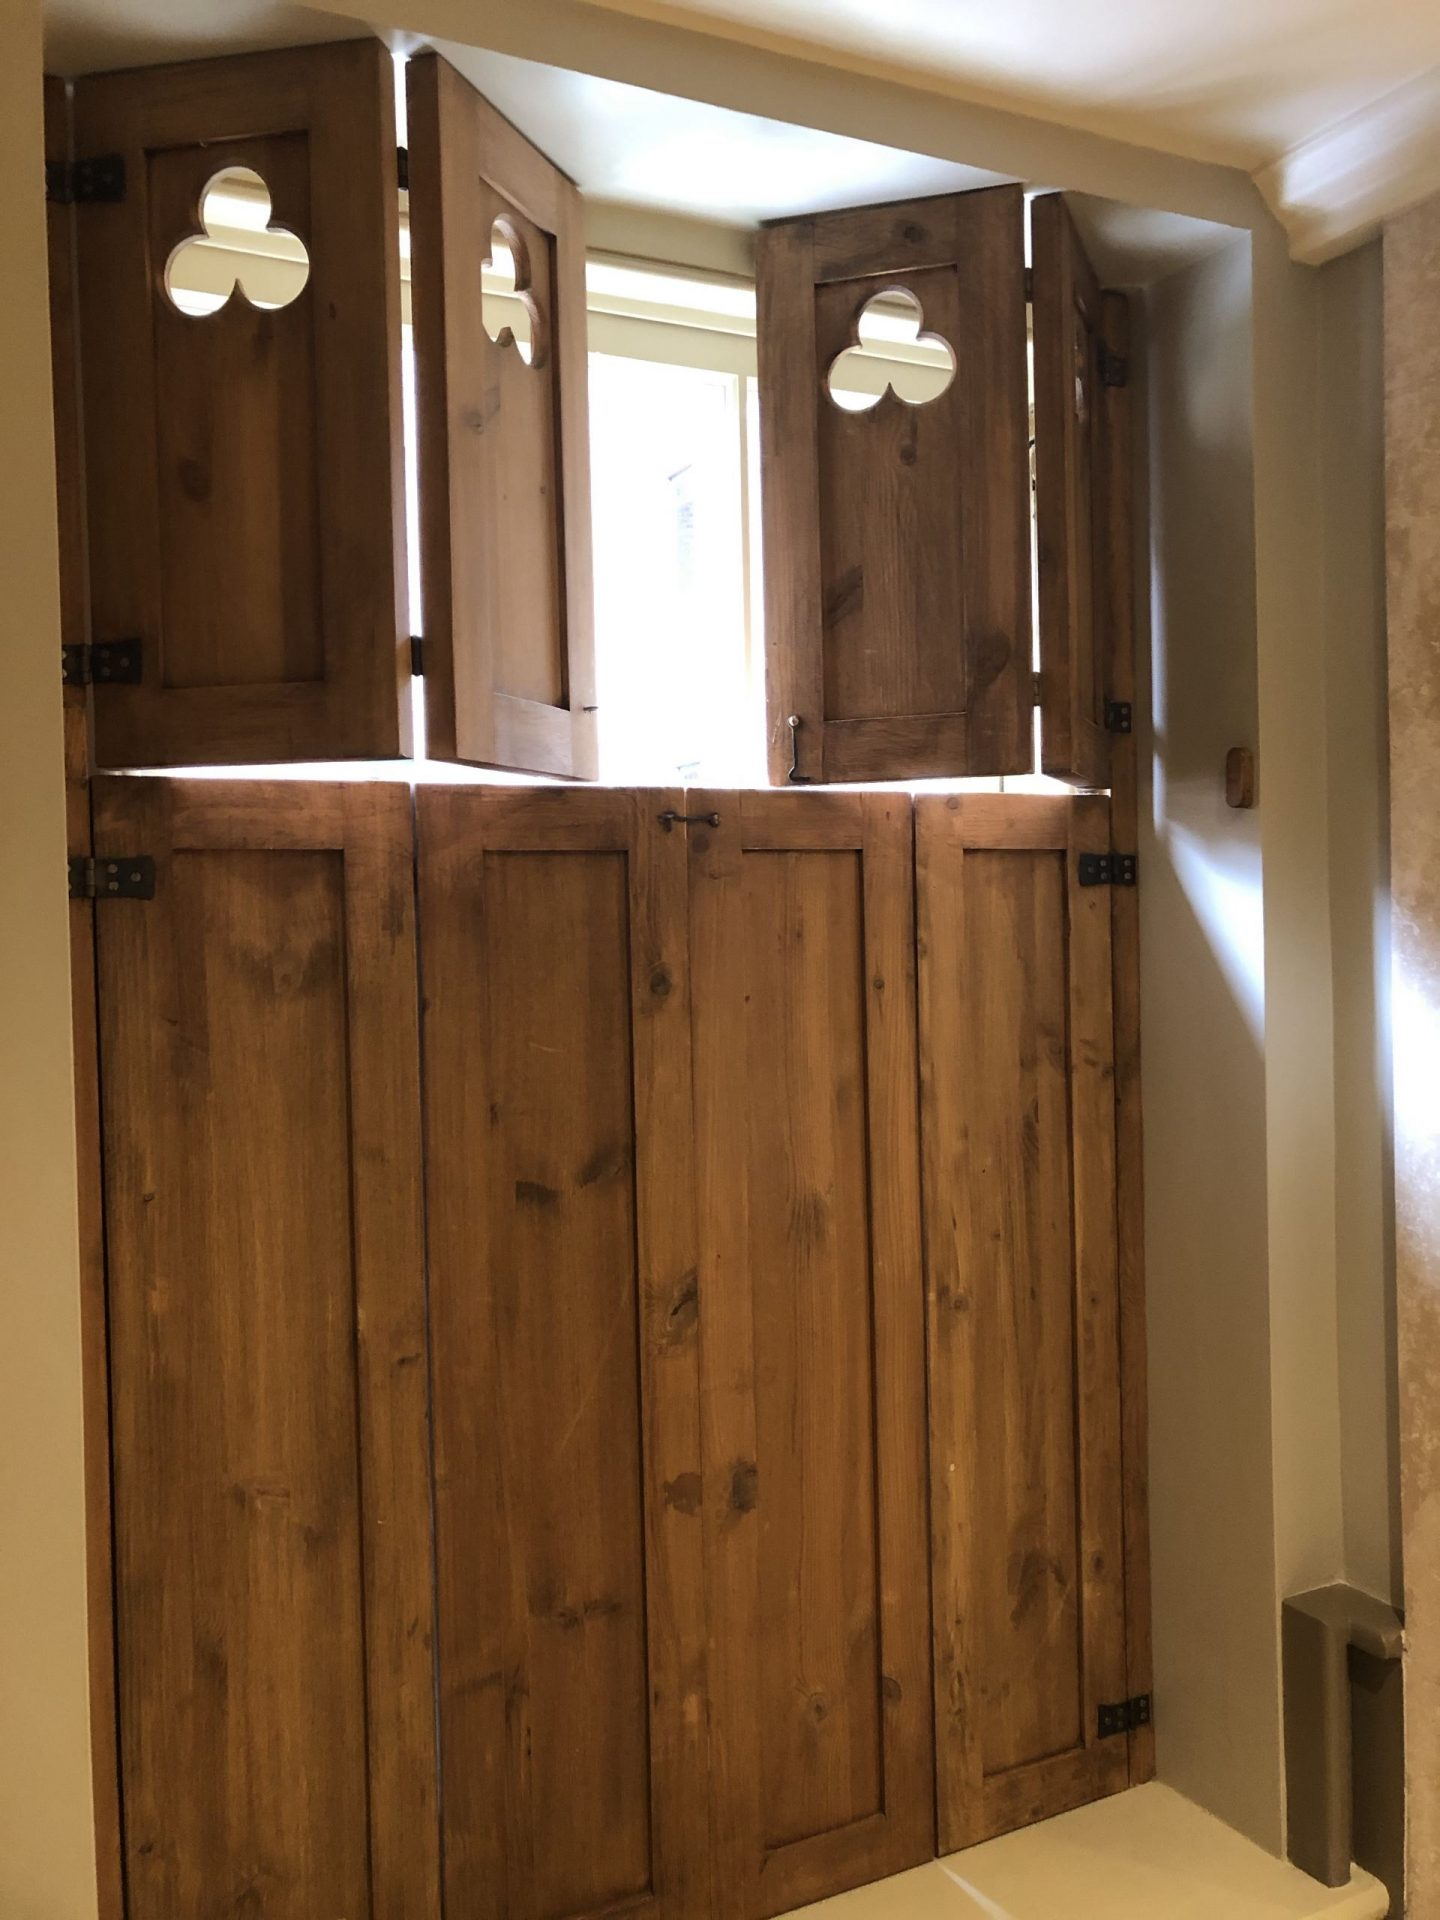 bathroom at batty langleys hotel near liverpool street